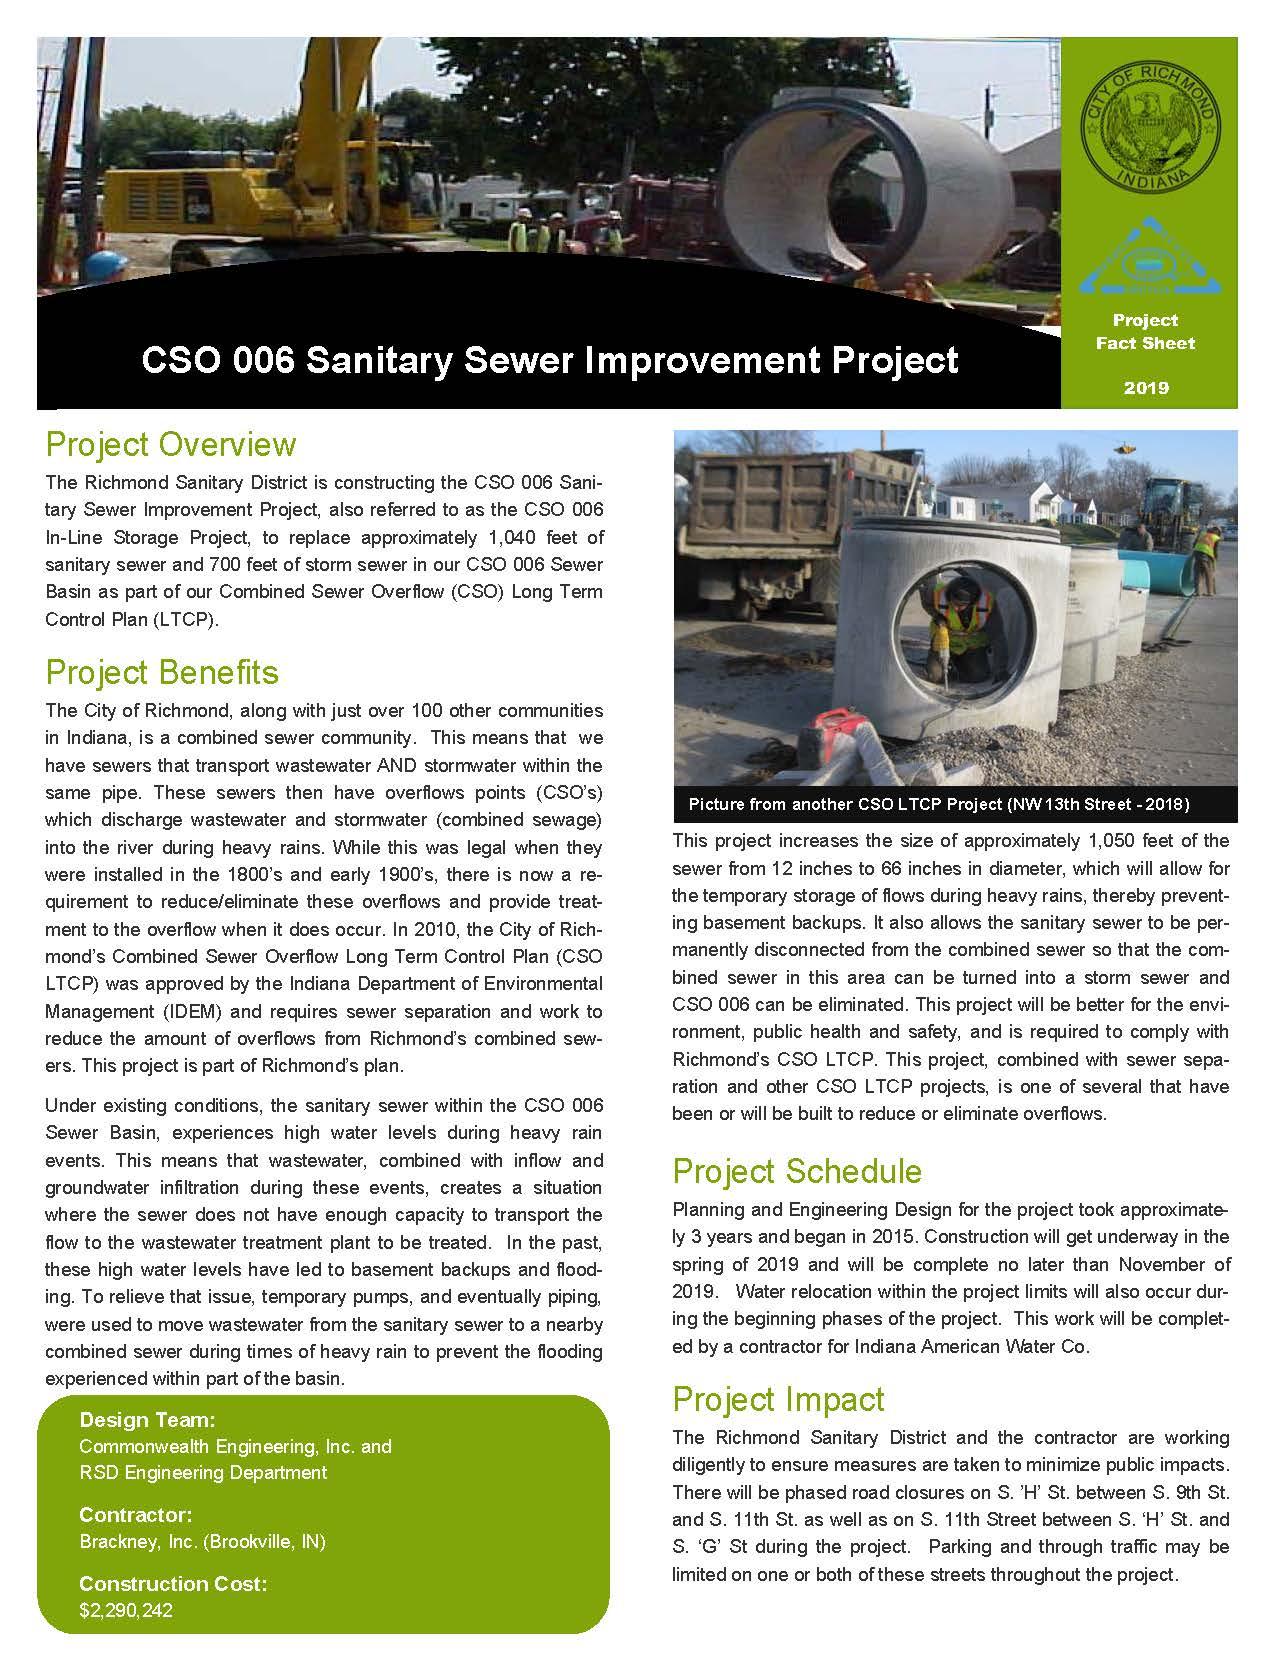 CSO 006 Sanitary Sewer Improvement Project Description